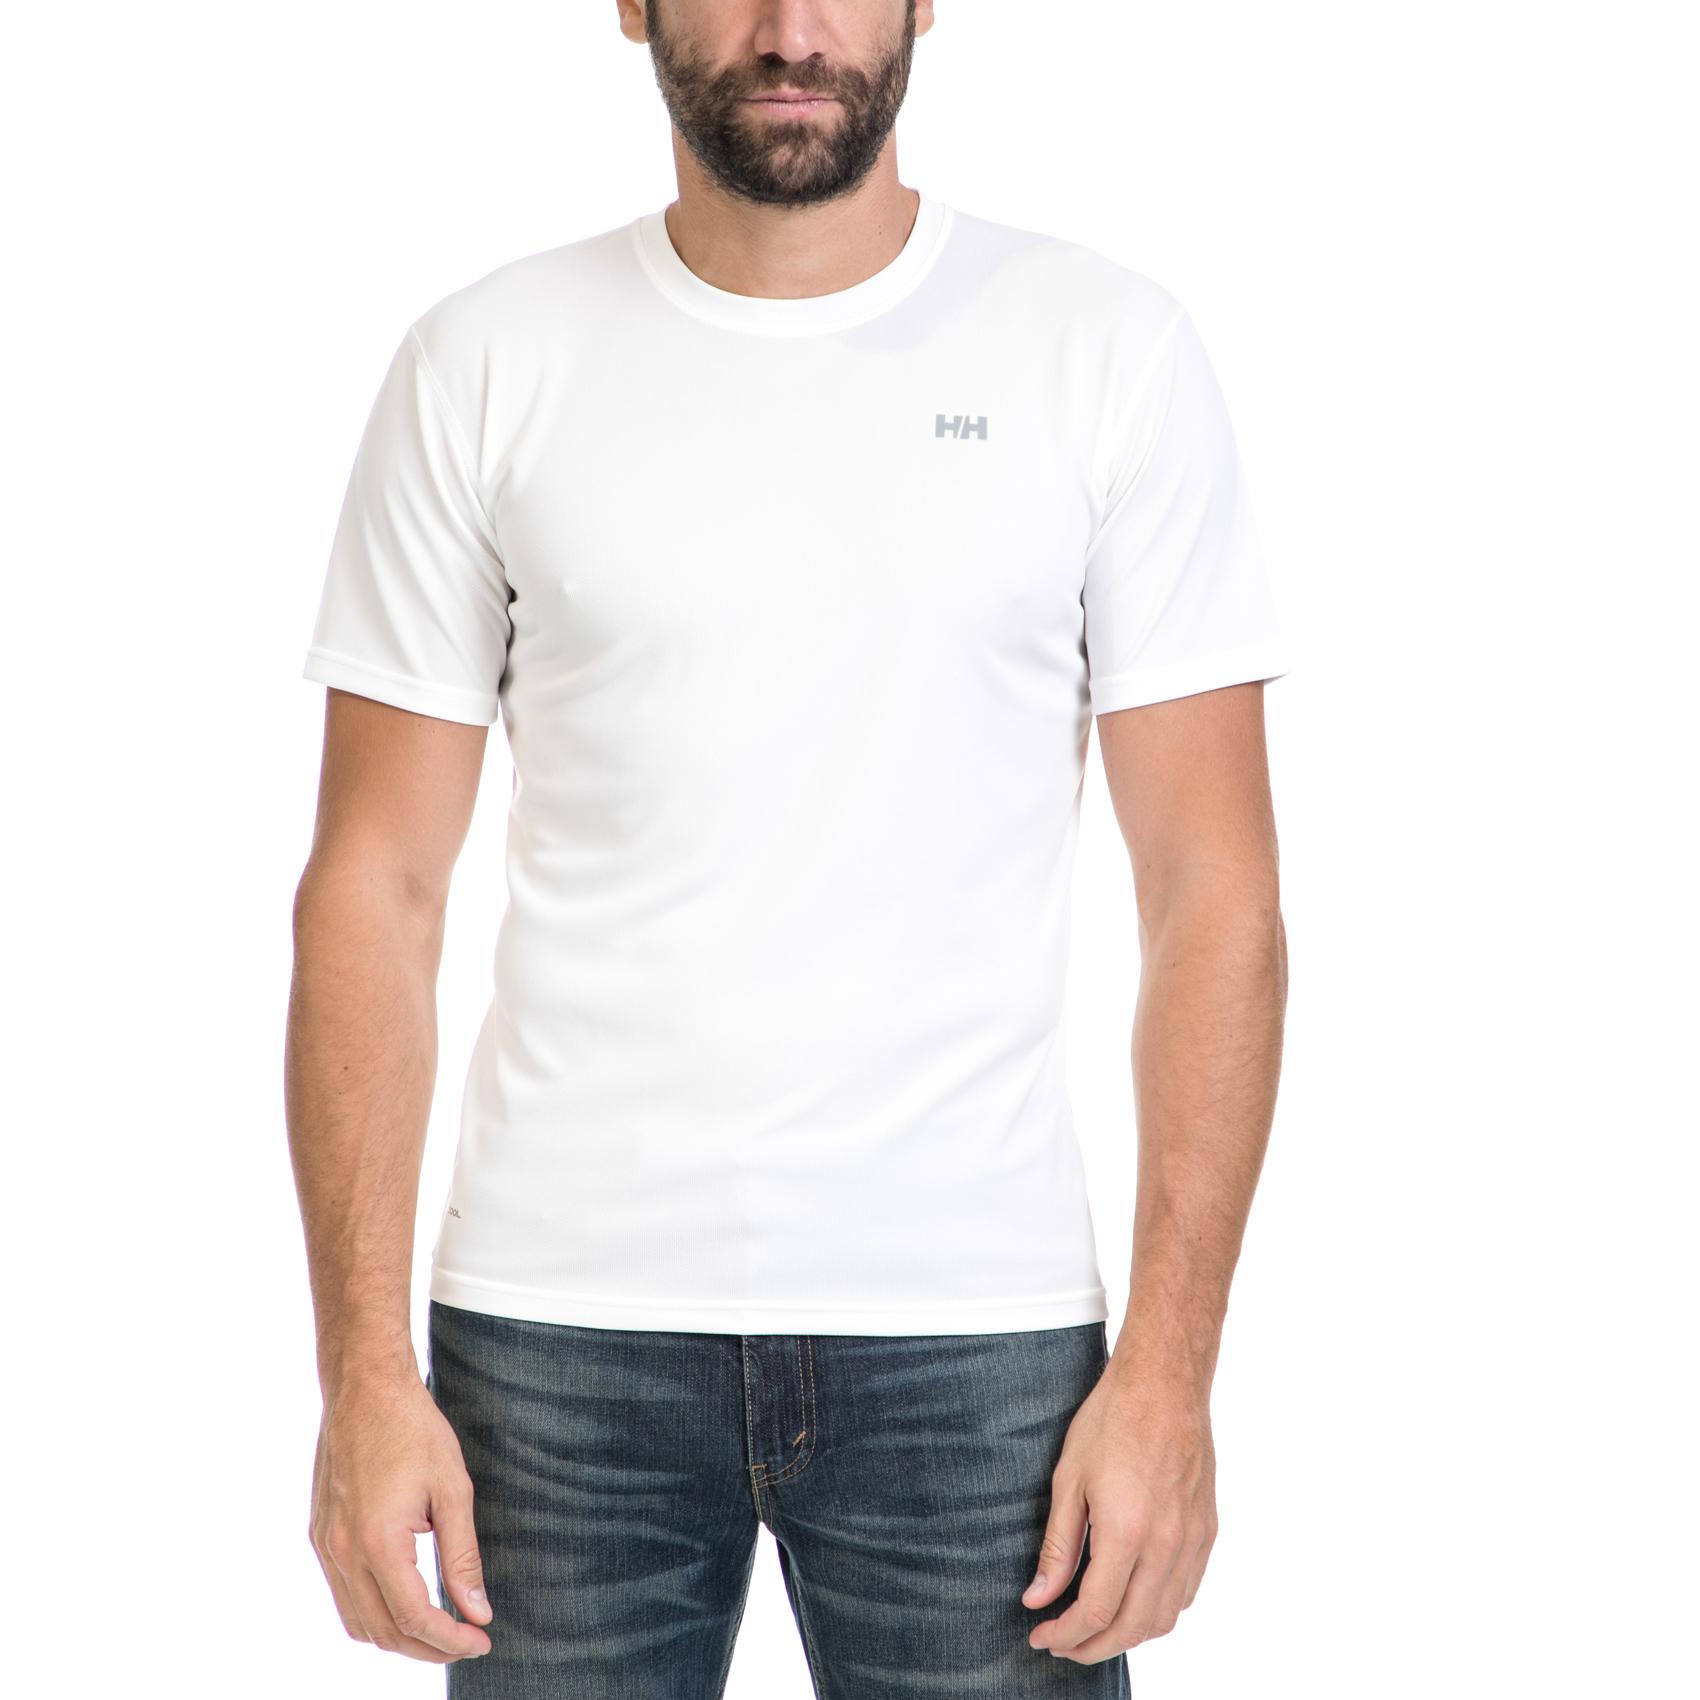 HELLY HANSEN - Ανδρική μπλούζα TRAINING λευκή ανδρικά ρούχα αθλητικά t shirt